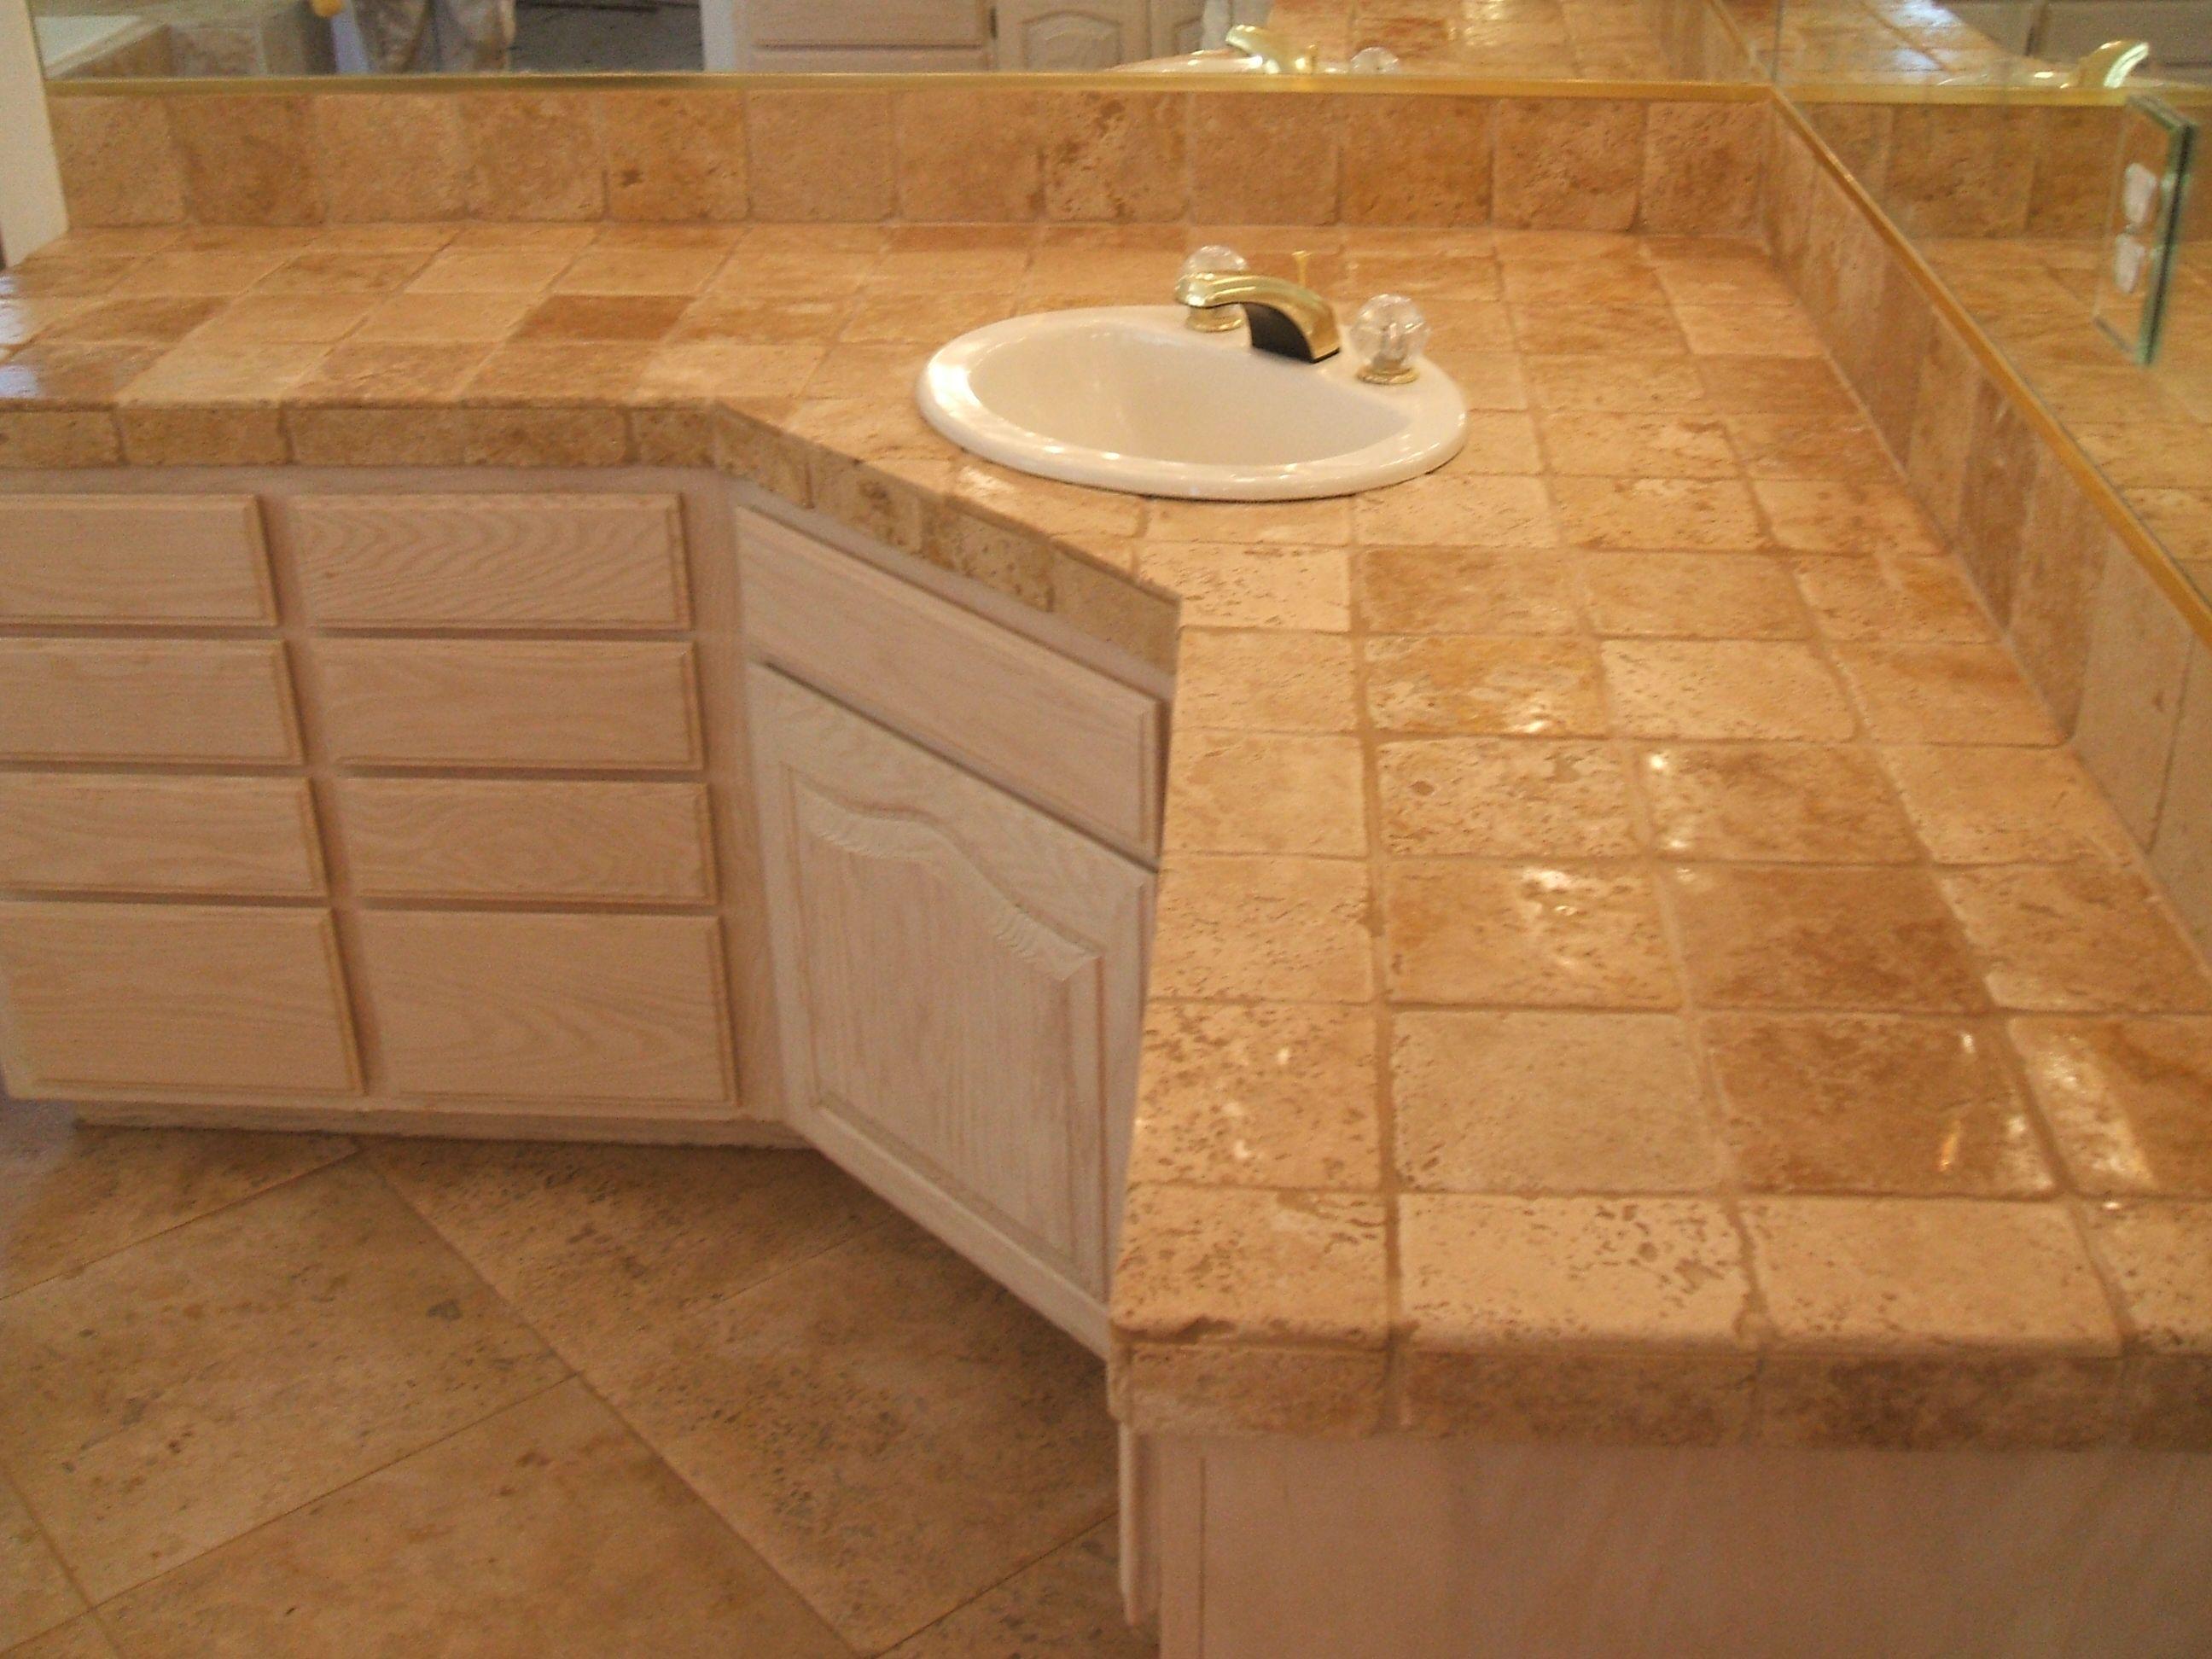 Beautiful Bathroom Countertop Tile Designs Bathroom Various Materials And Shapes For Bathroom Tile Countertops Bathroom Countertops Bathroom Countertops Diy